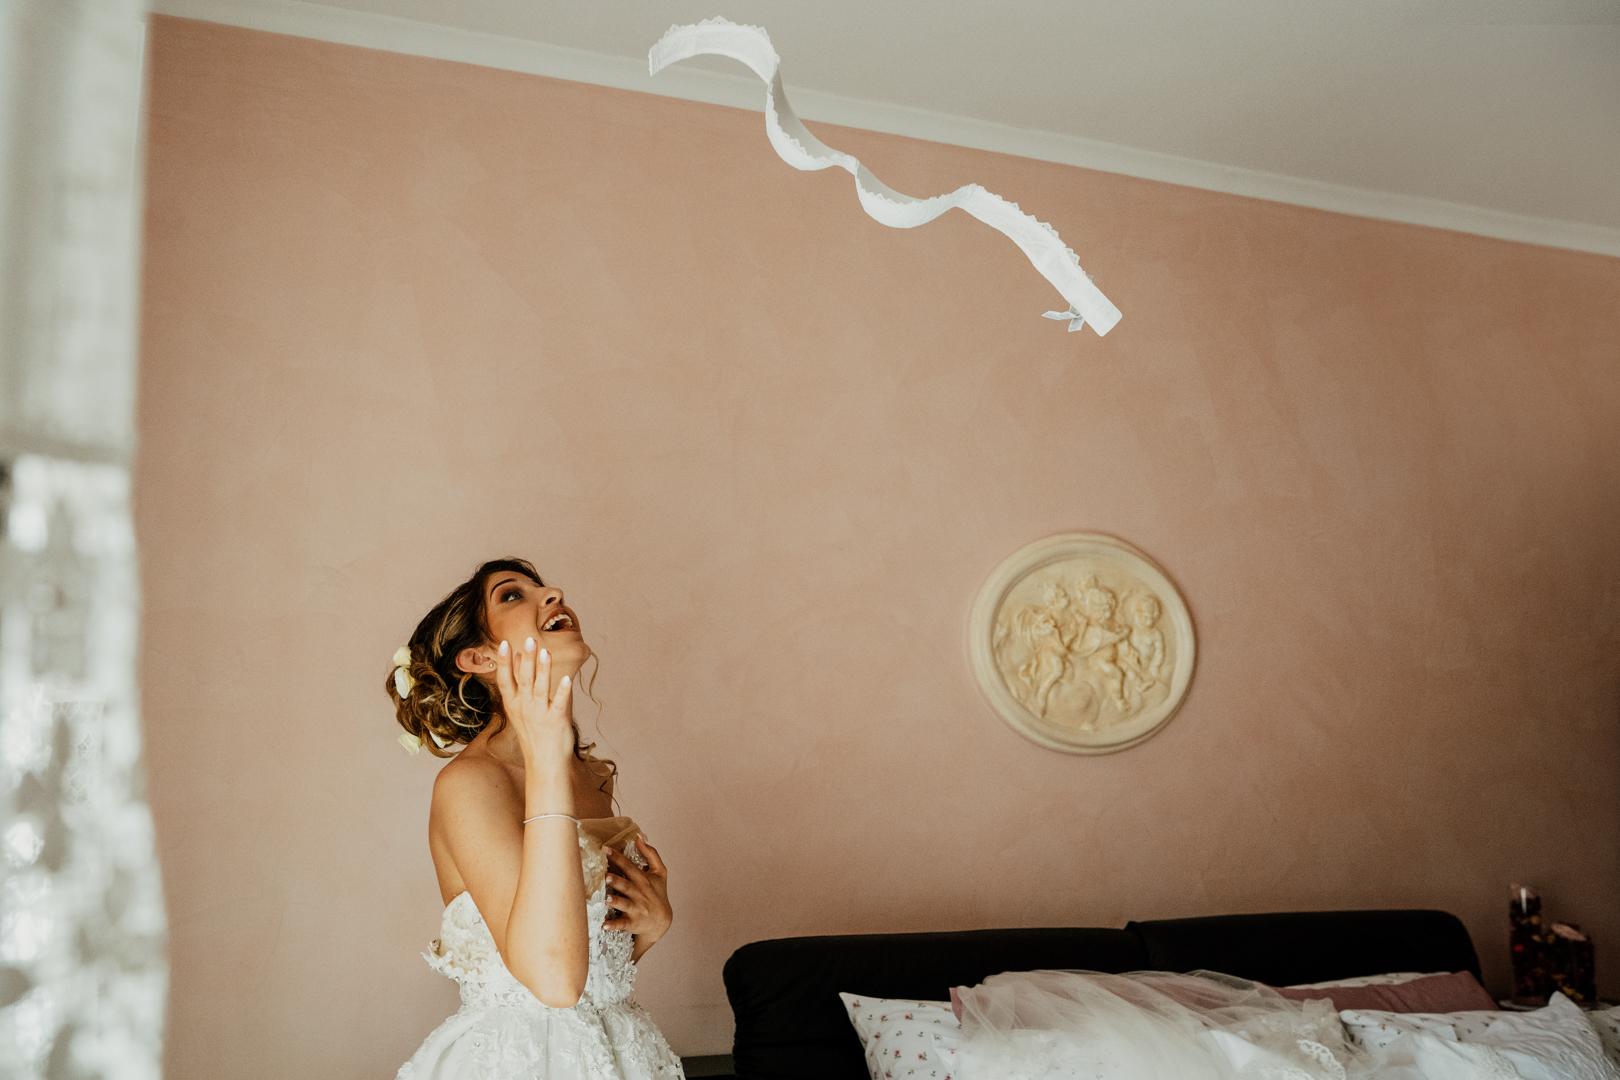 7 gianni-lepore-bride-reggiseno